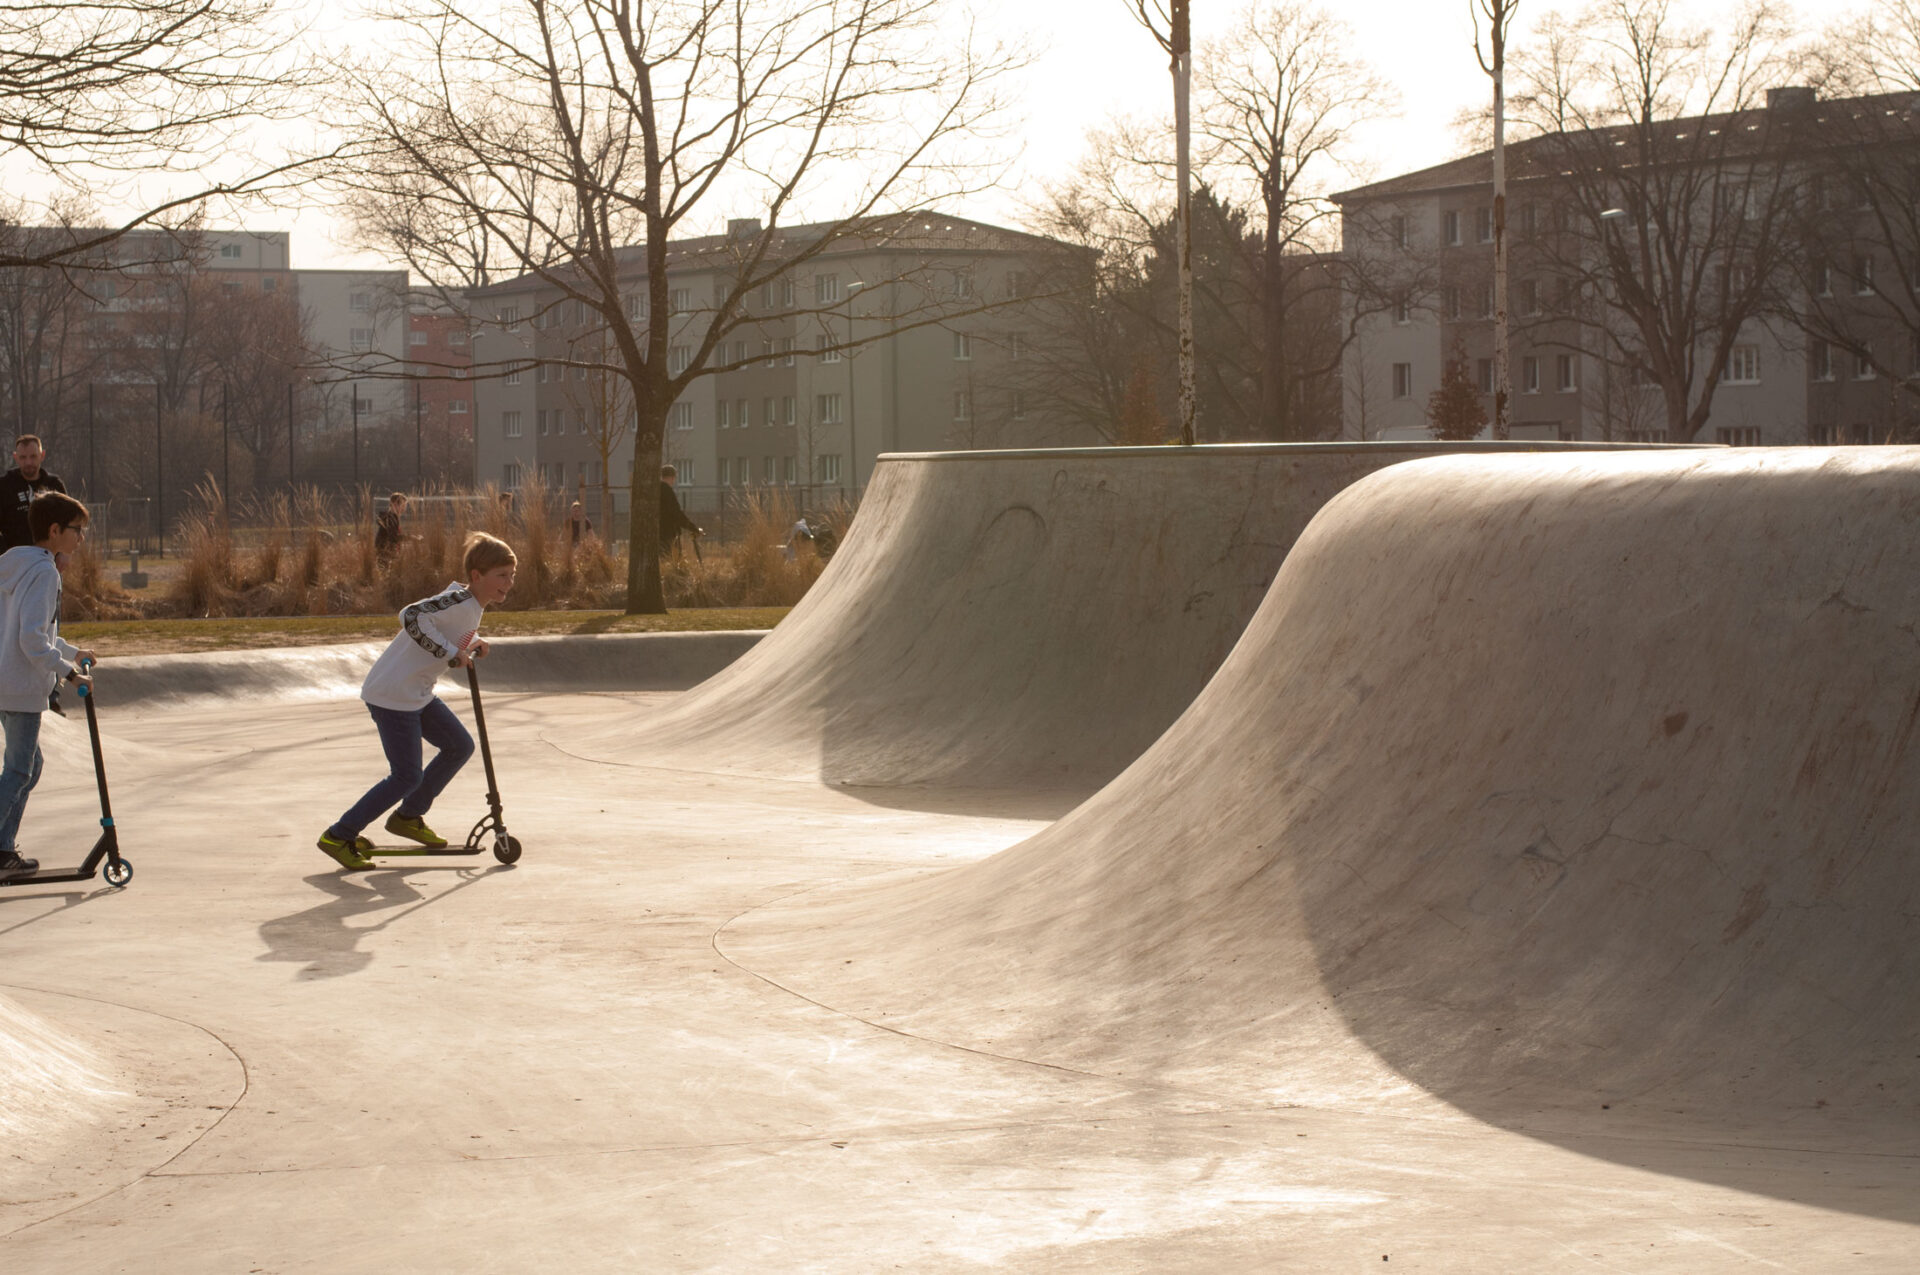 Frühling im Skatepark Reese-Kaserne Augsburg